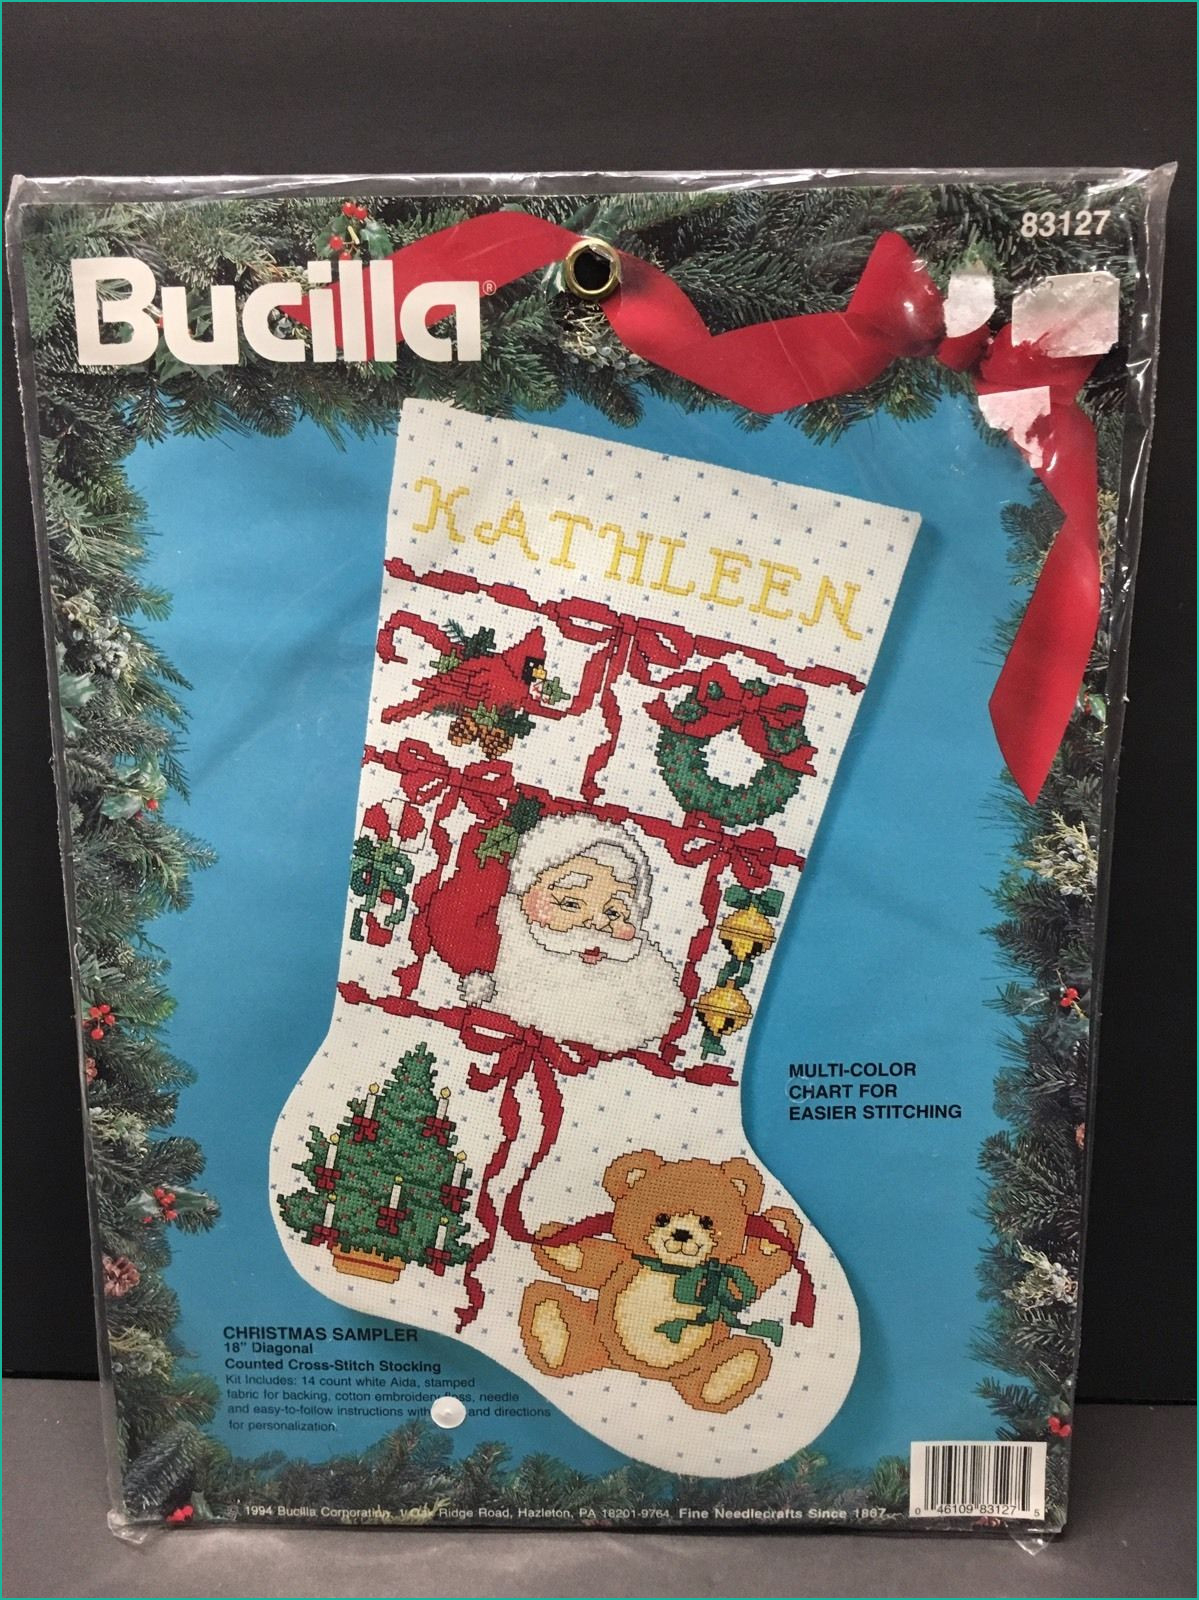 59 Marvelous Cross Stitch Christmas Stockings Kits Images – Mauipaniolo - Free Printable Cross Stitch Christmas Stocking Patterns